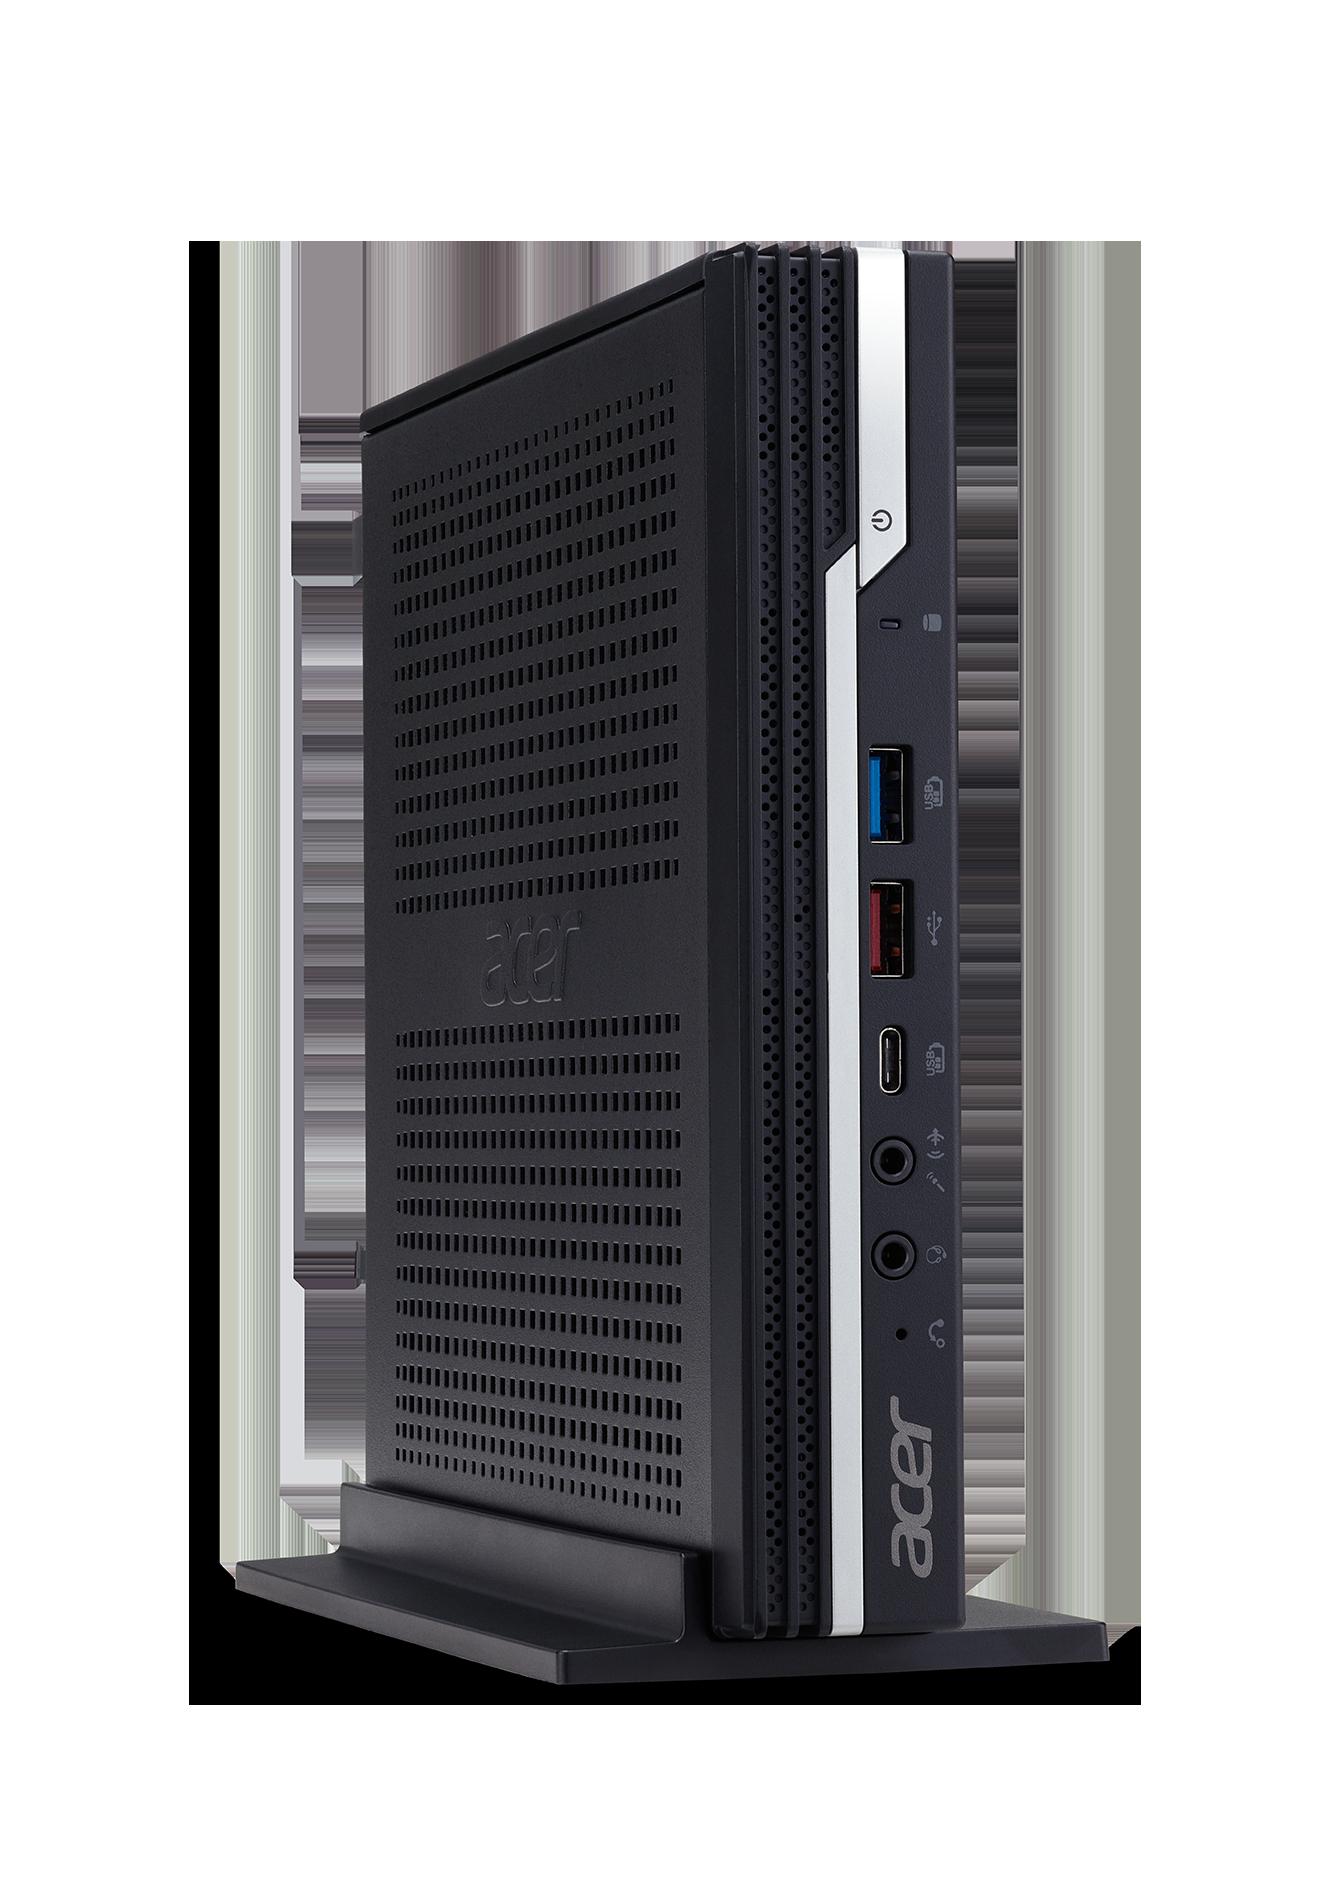 Acer Veriton N (VN4670GT) - i5-10400/512SSD/8G/W10Pro - DT.VTZEC.006